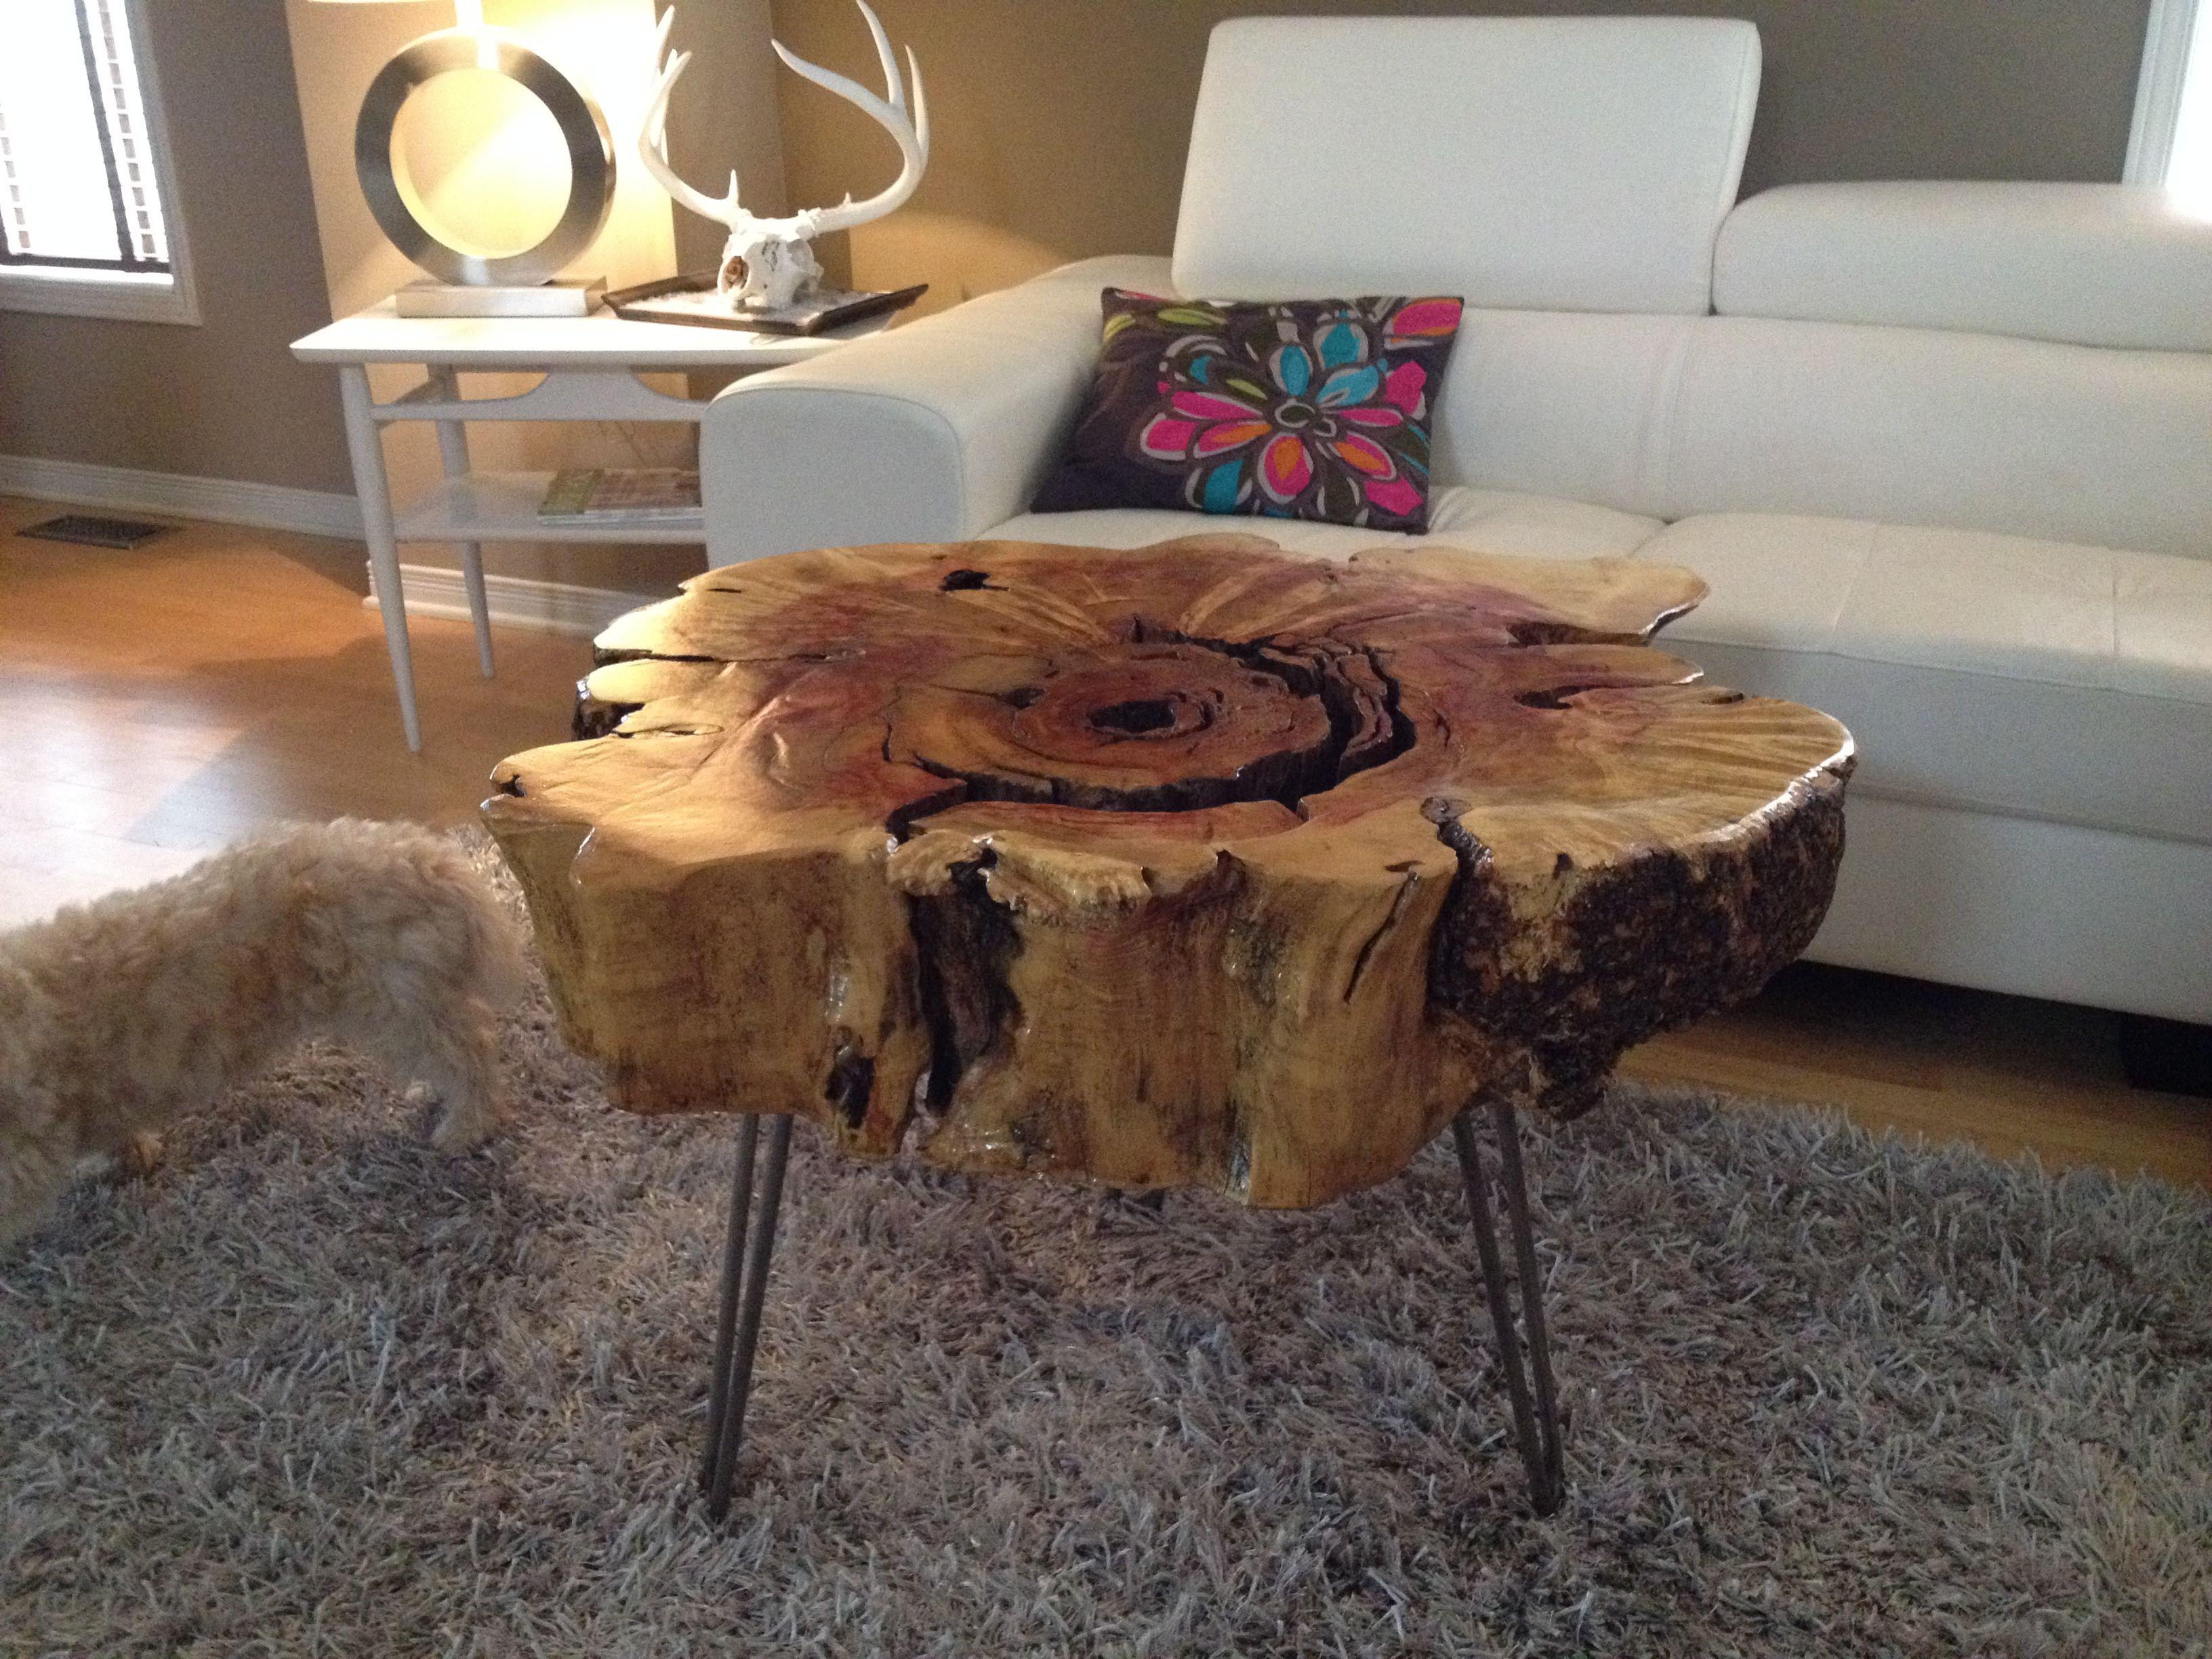 Pin Em Tree Stump Tables Stump Side Tables Root Coffee Tables Tree Root Coffee Table Live Edge Coffee Tables Wood Metal Benches Log Furniture Ha [ 2448 x 3264 Pixel ]